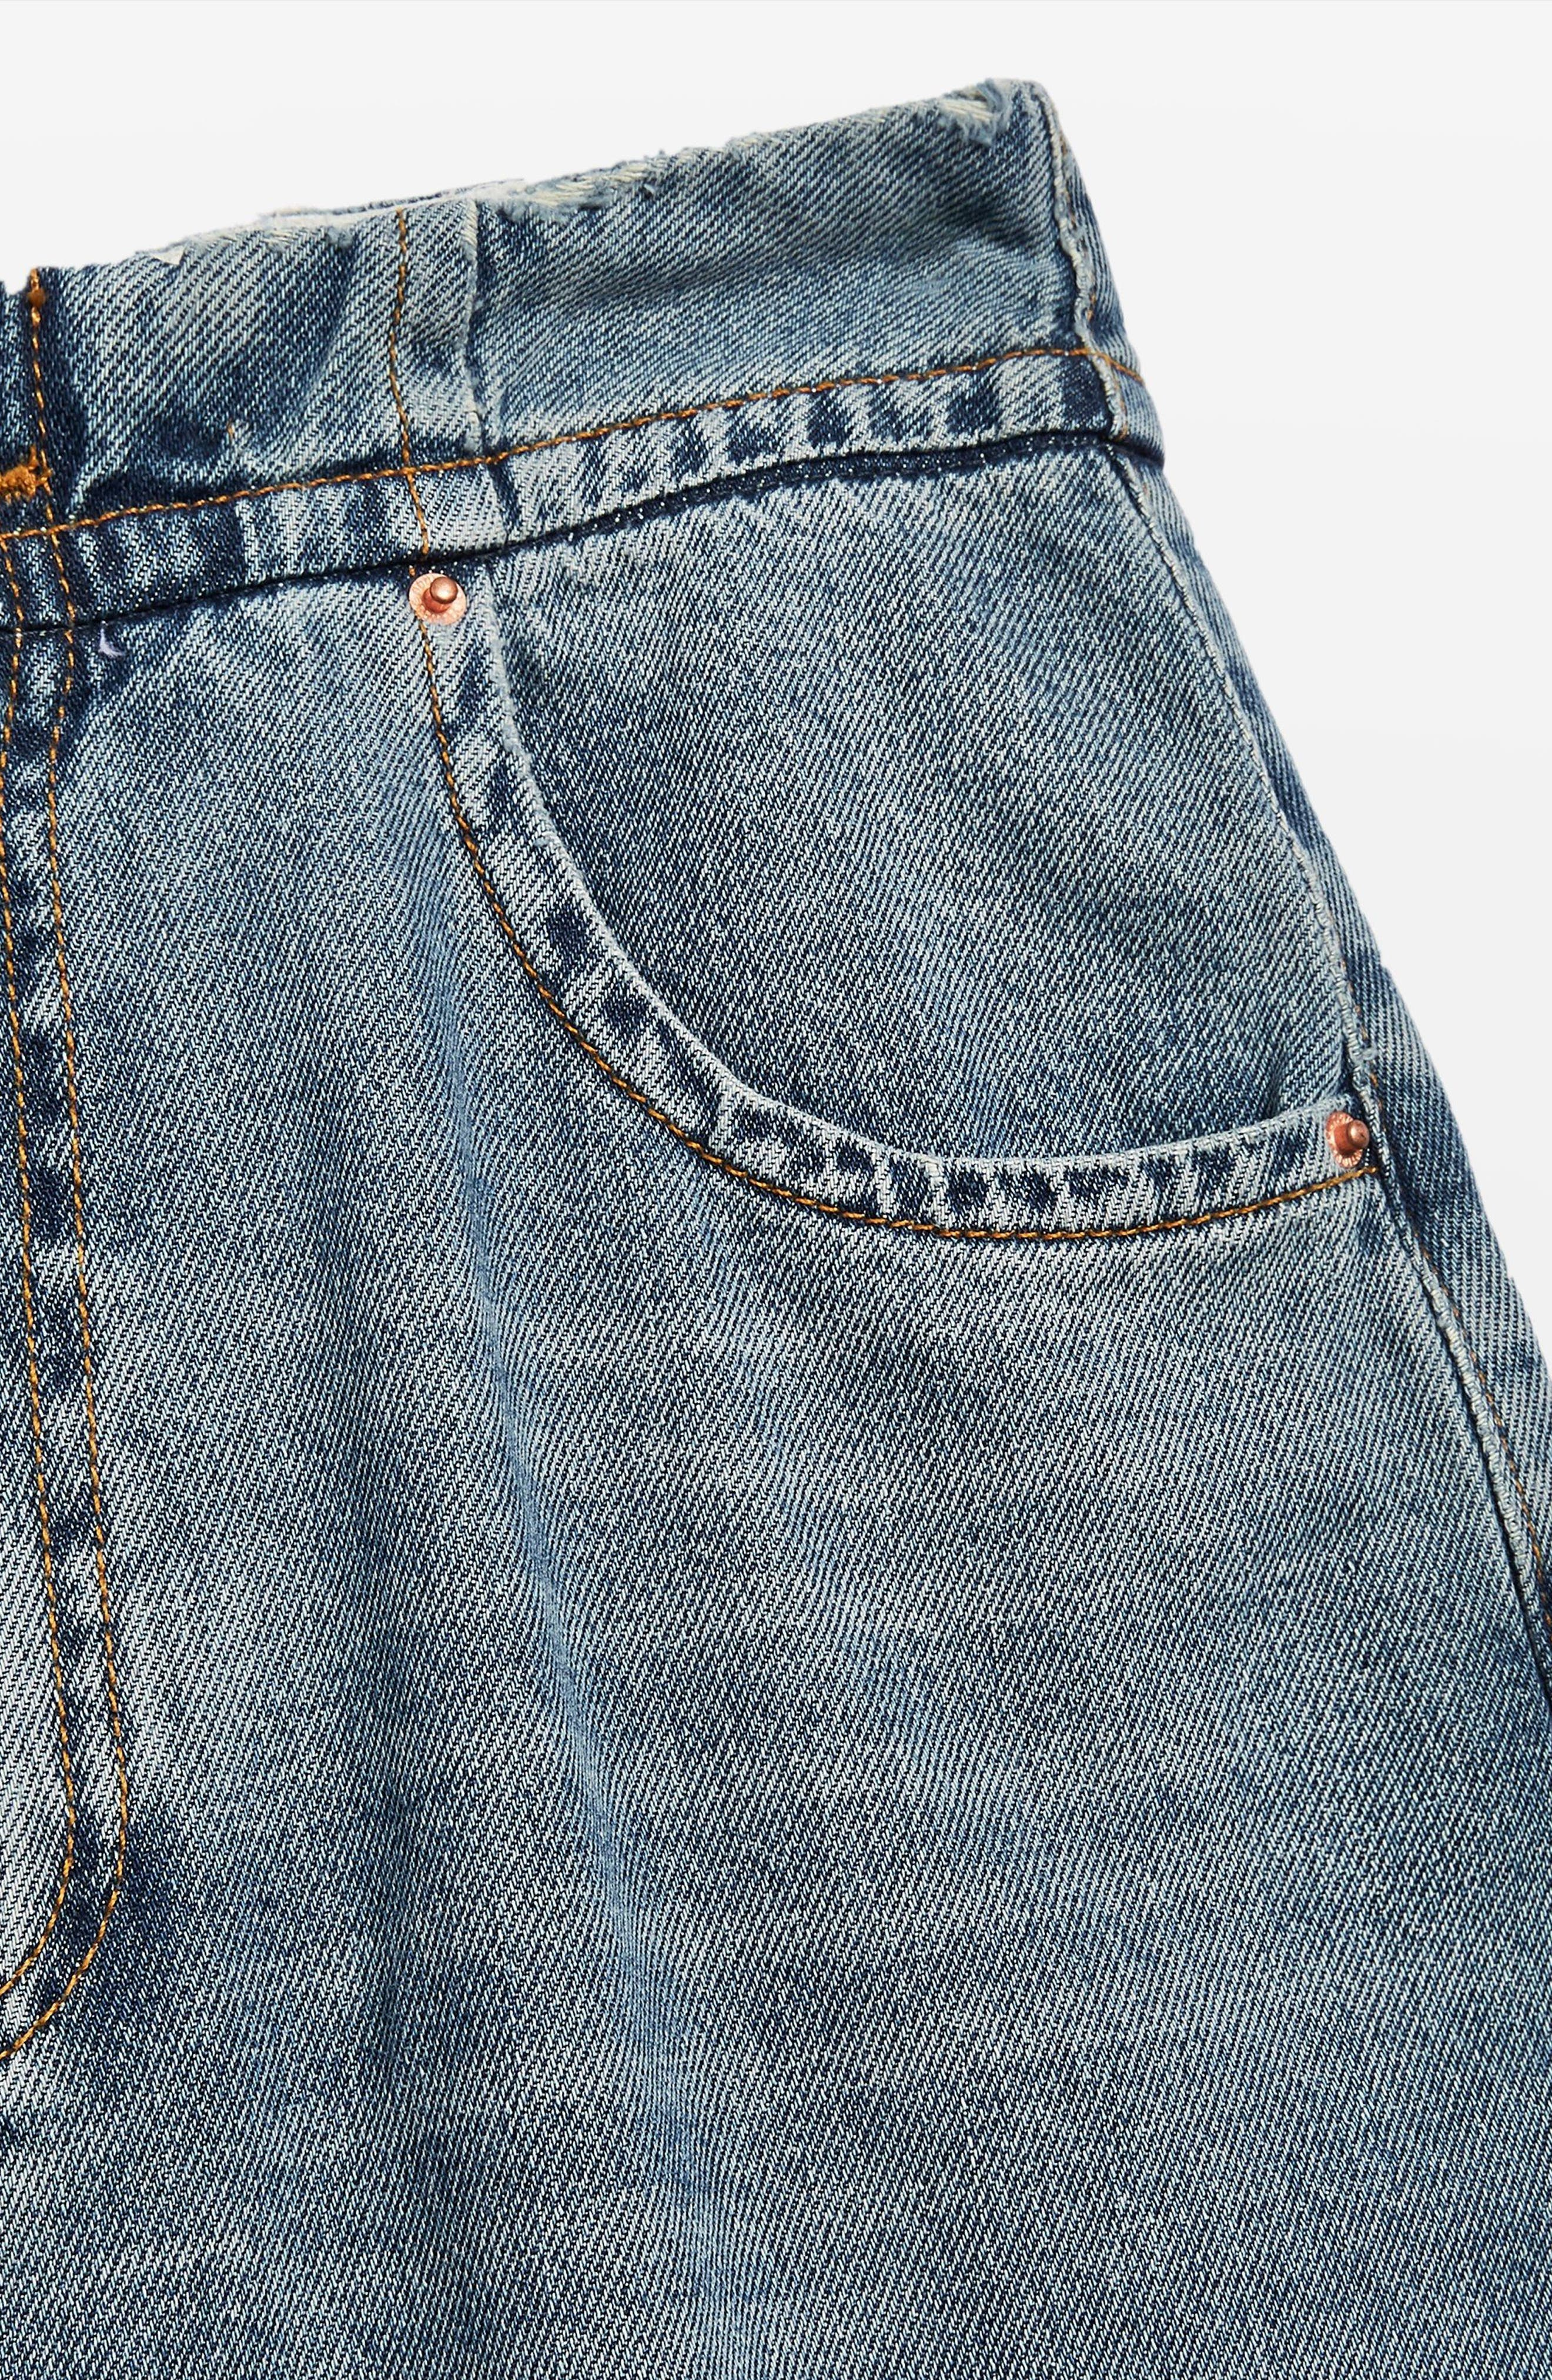 Slouch Cinch Jeans,                             Alternate thumbnail 4, color,                             420